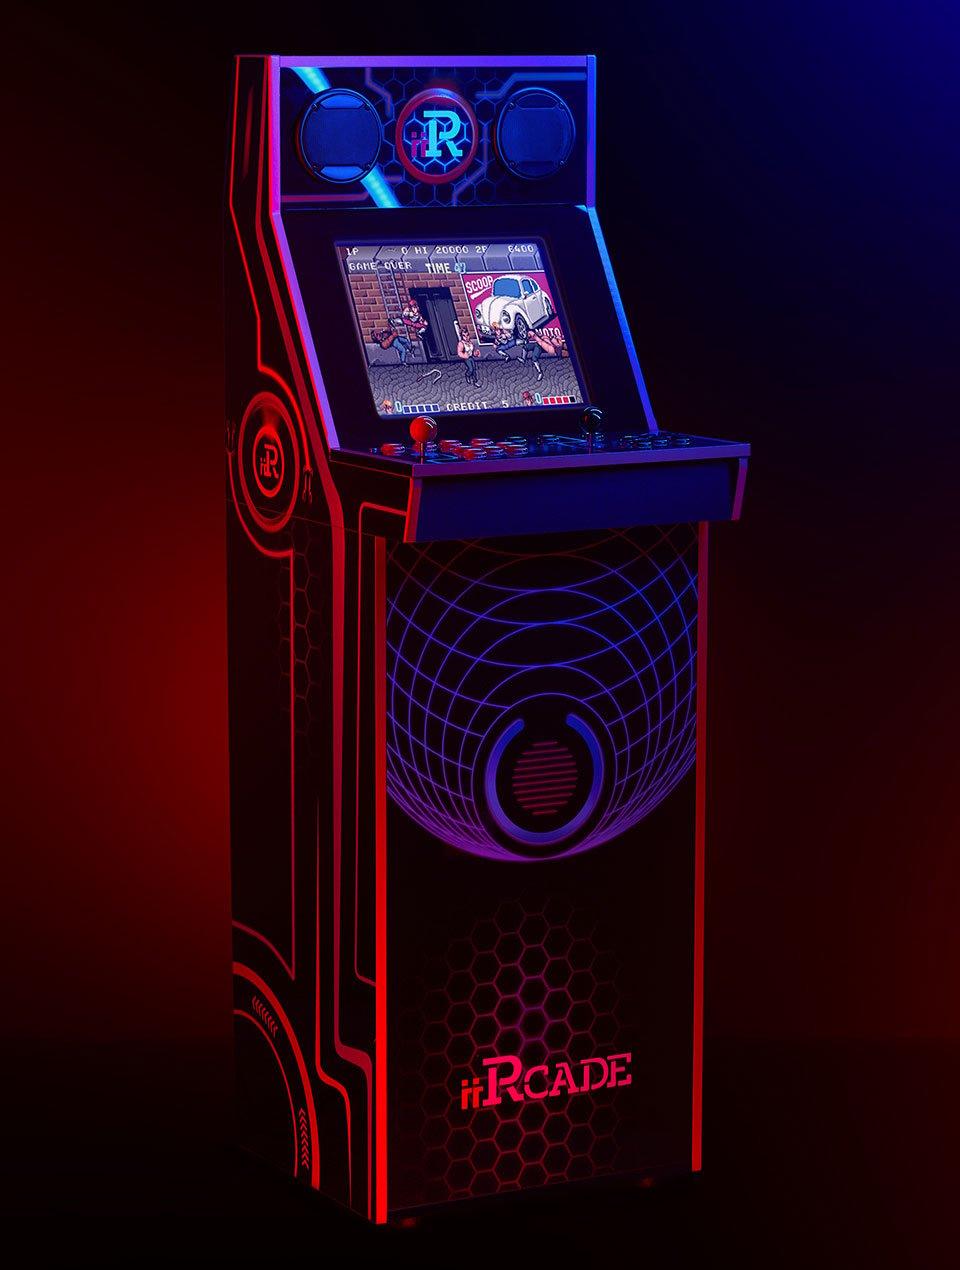 iiRcade Arcade System